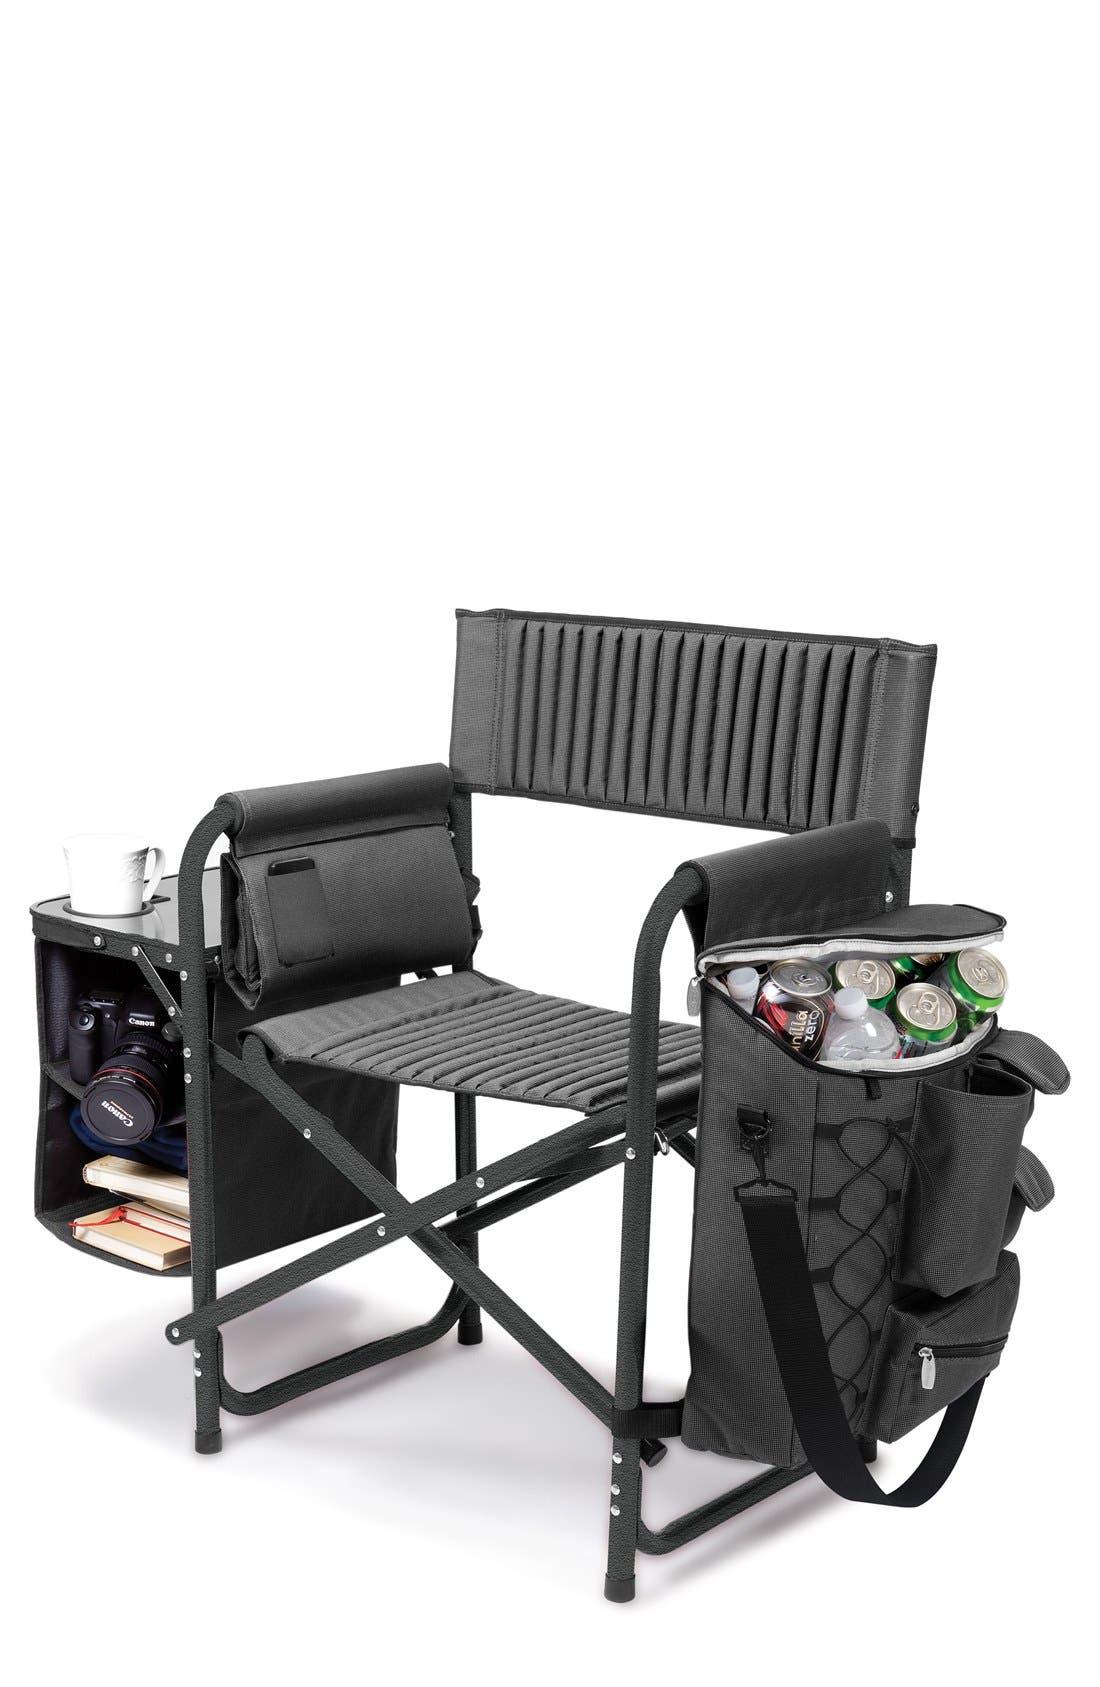 'Fusion' Lawn Chair,                             Main thumbnail 1, color,                             Black